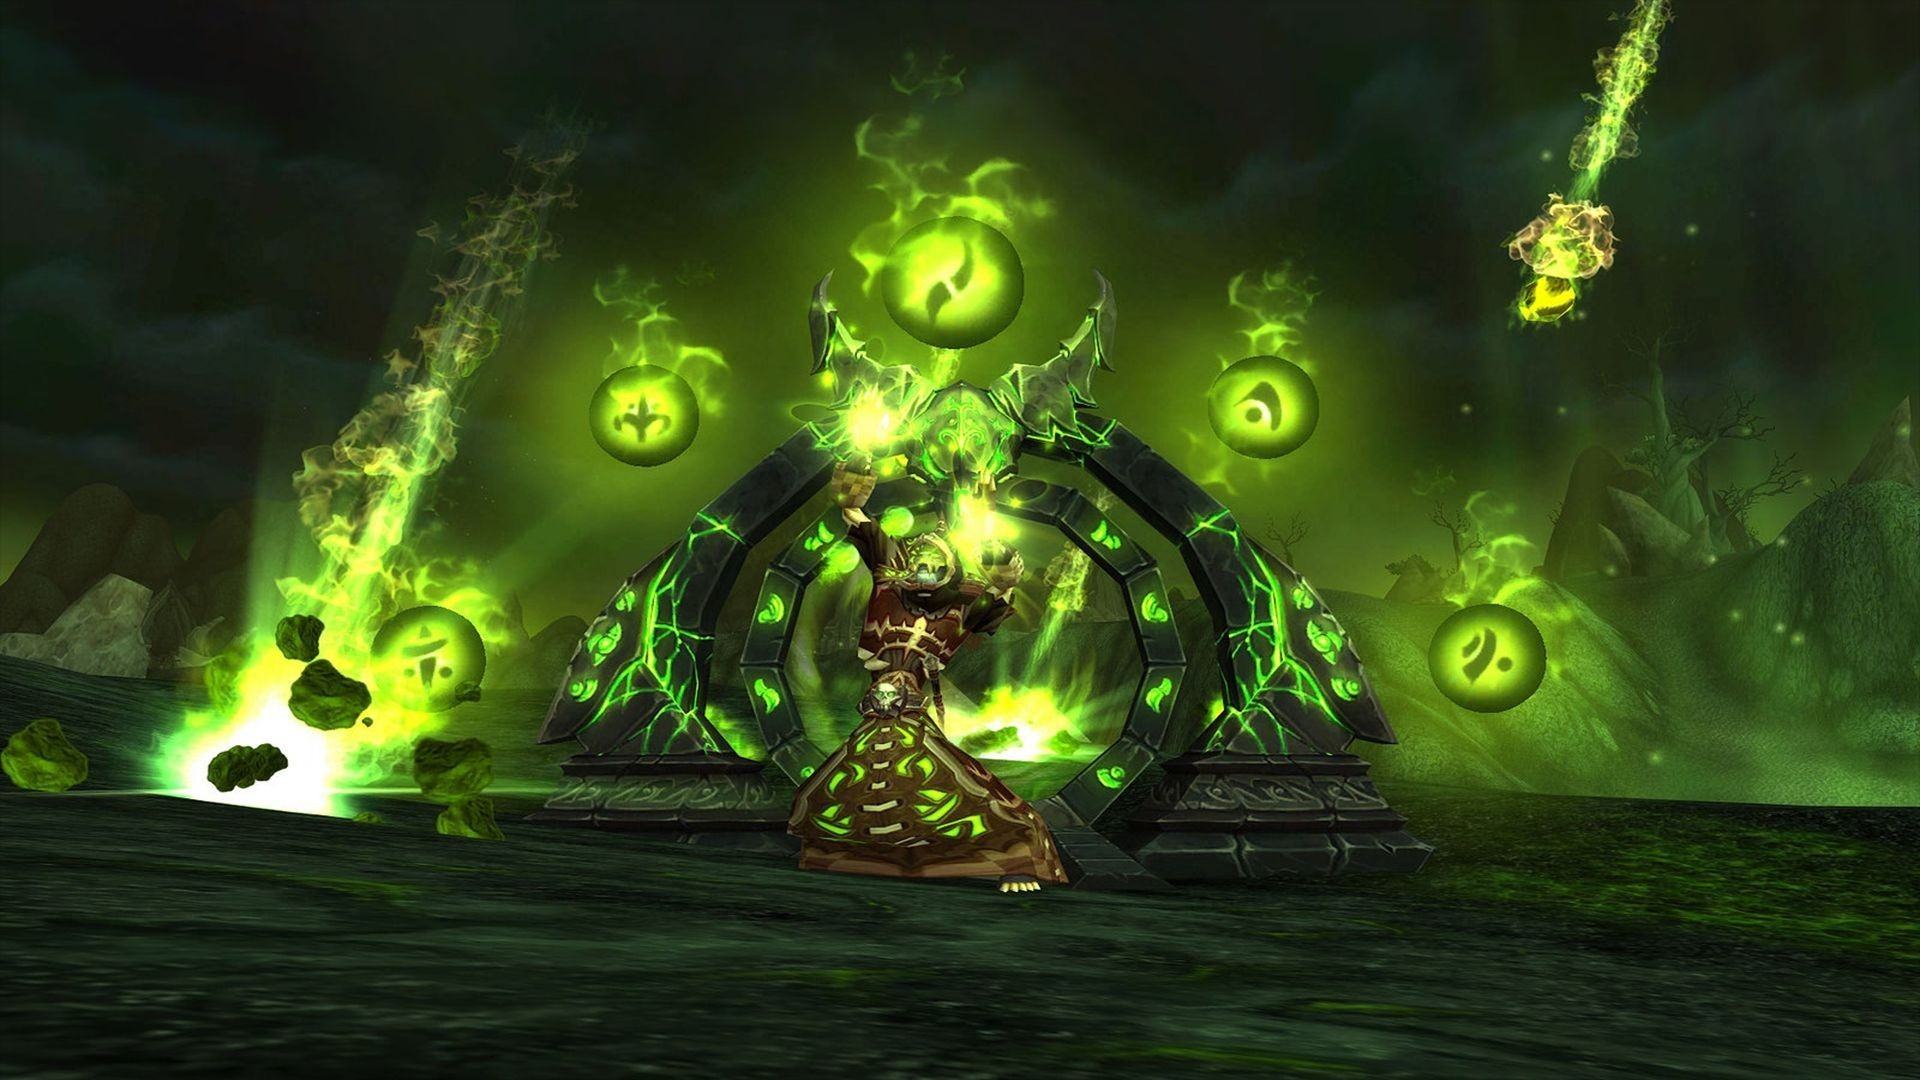 World Of Warcraft Backgrounds 1920x1080